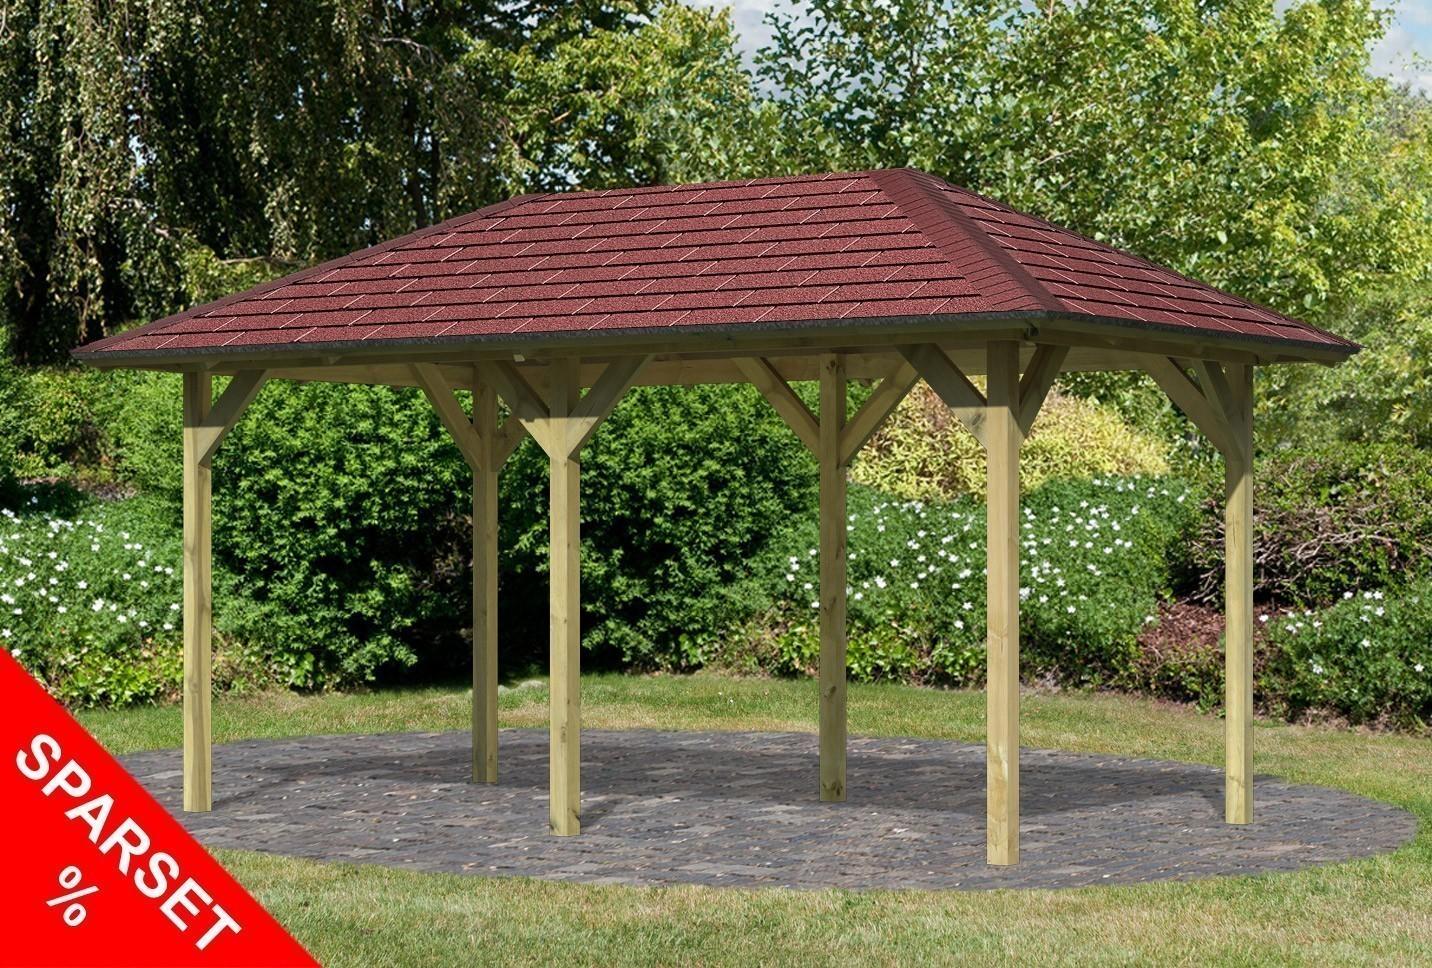 karibu holzpavillon lillehammer 2 kdi 491x284cm sparset mit schindeln bei. Black Bedroom Furniture Sets. Home Design Ideas